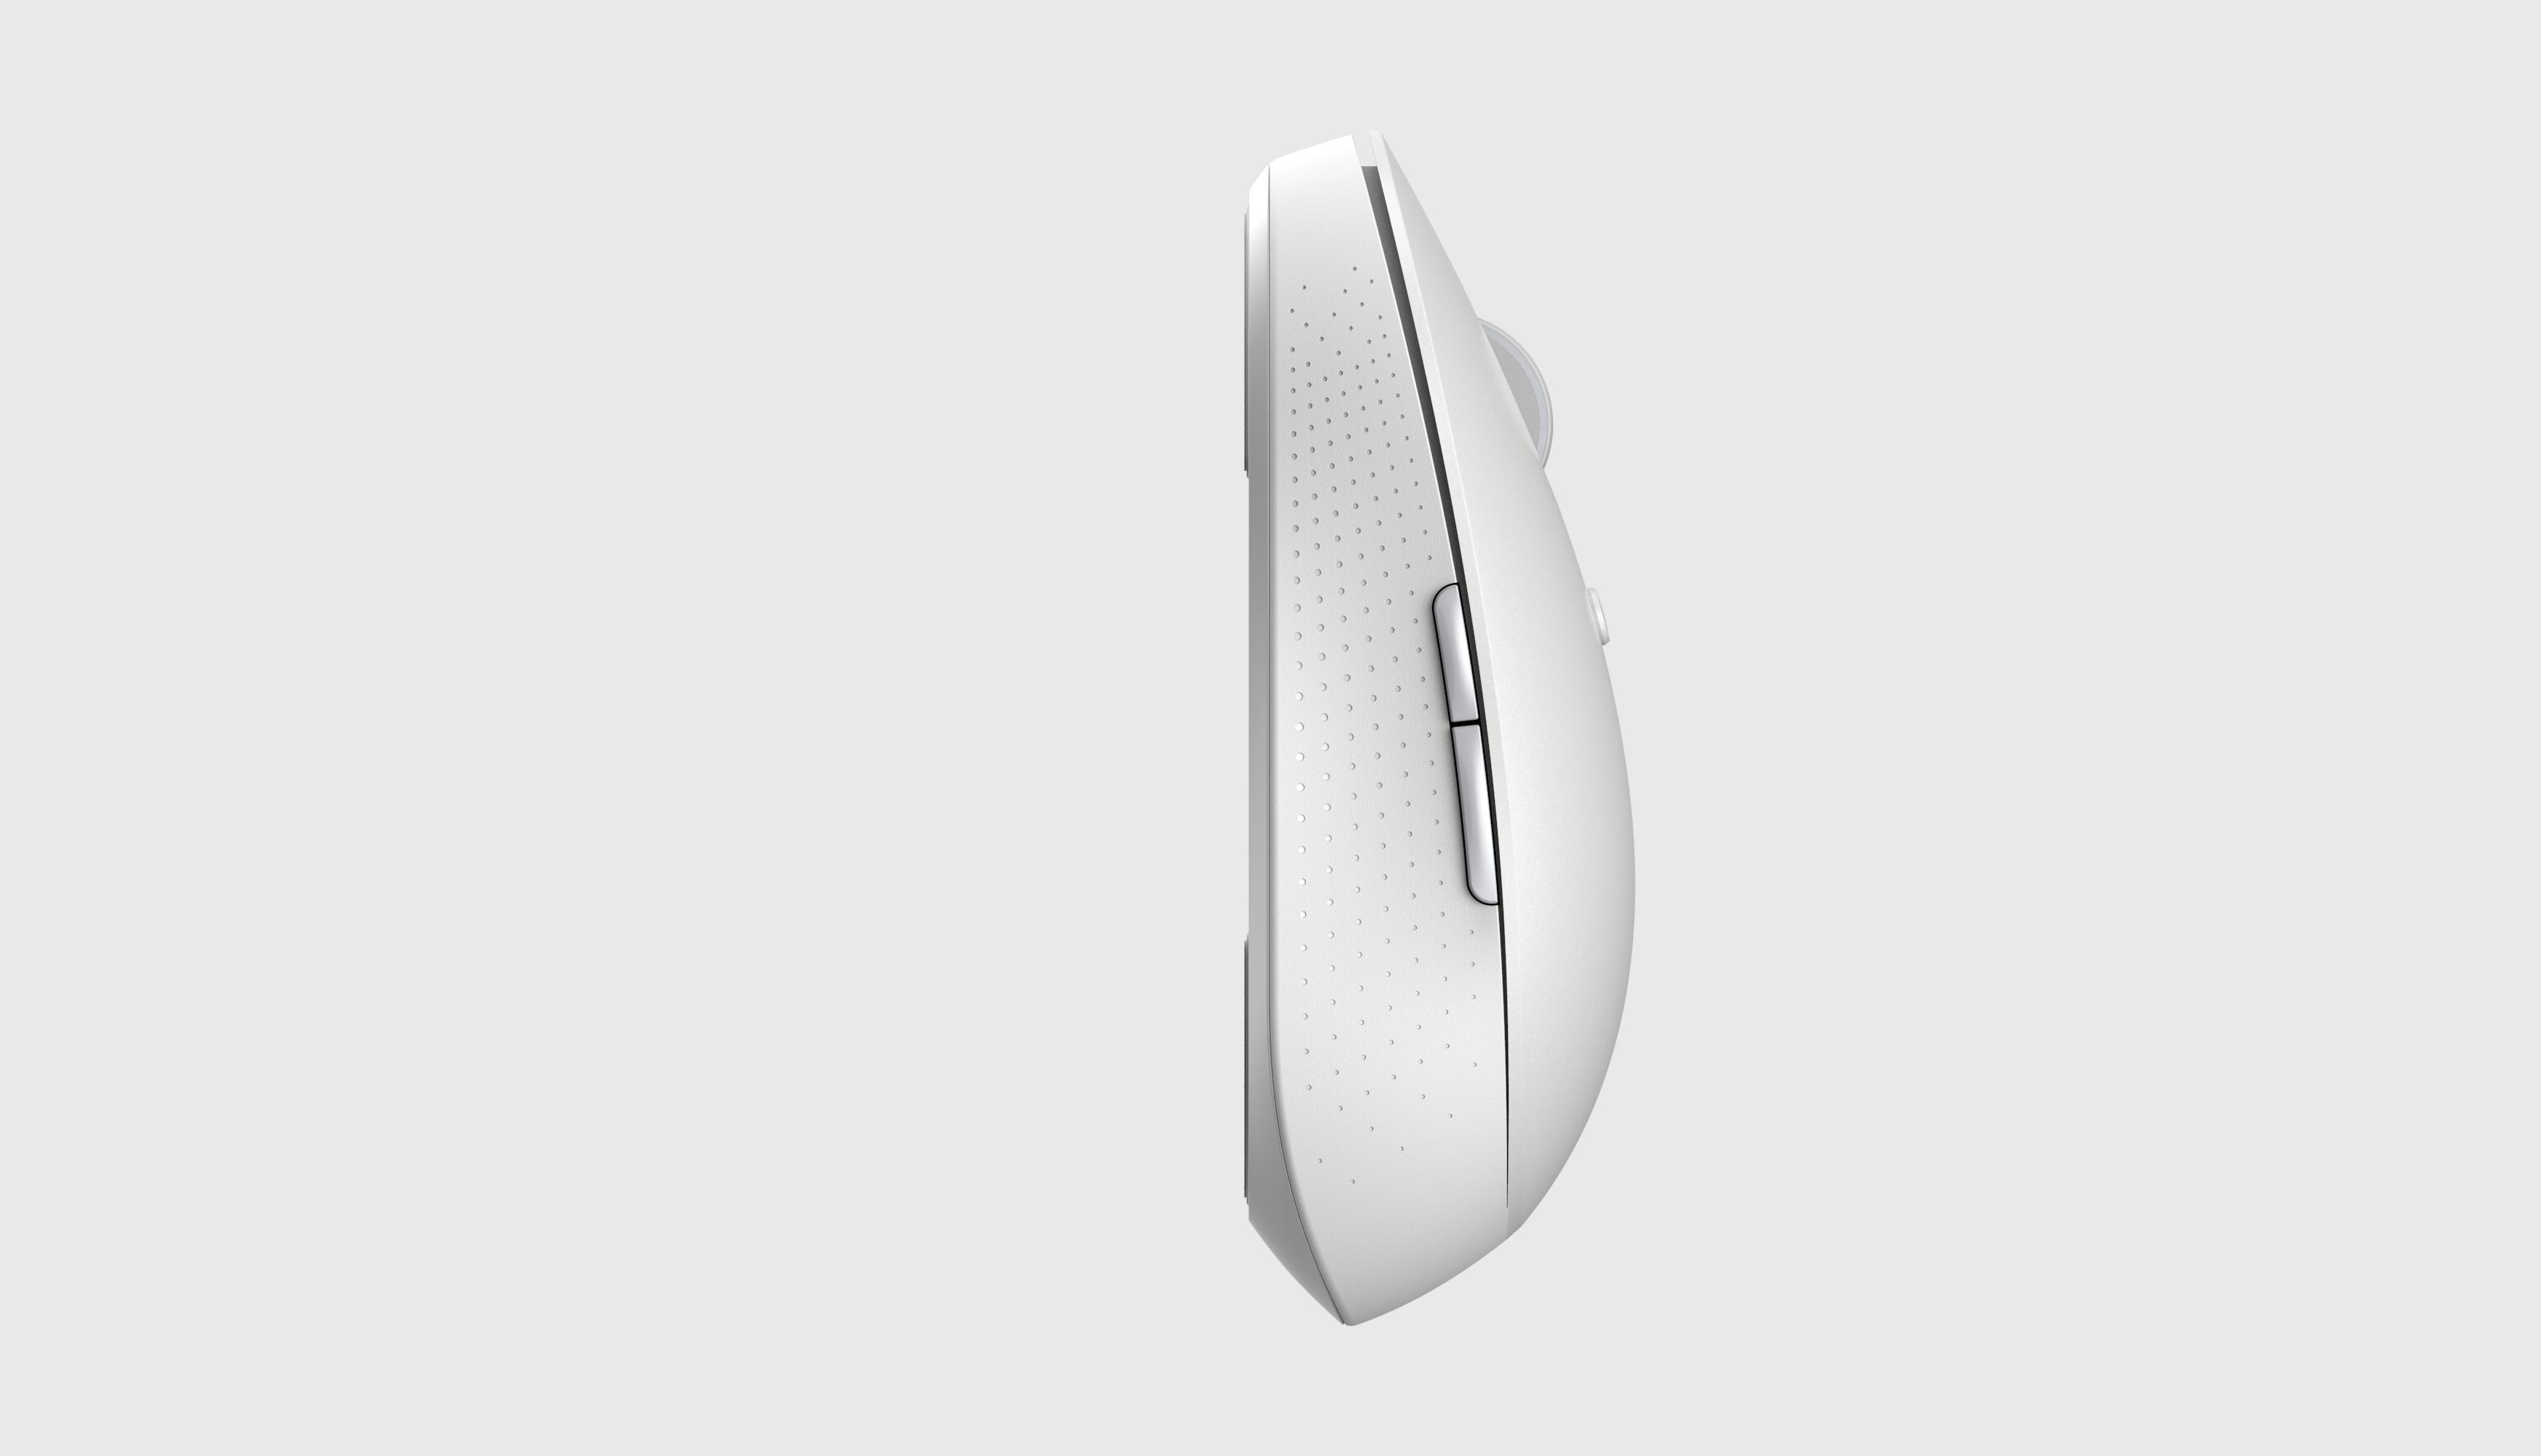 Xiaomi Mi Wireless Mouse Silent Edition Dual Mode เม้าส์ไร้สาย สีขาว (Global Version) - White